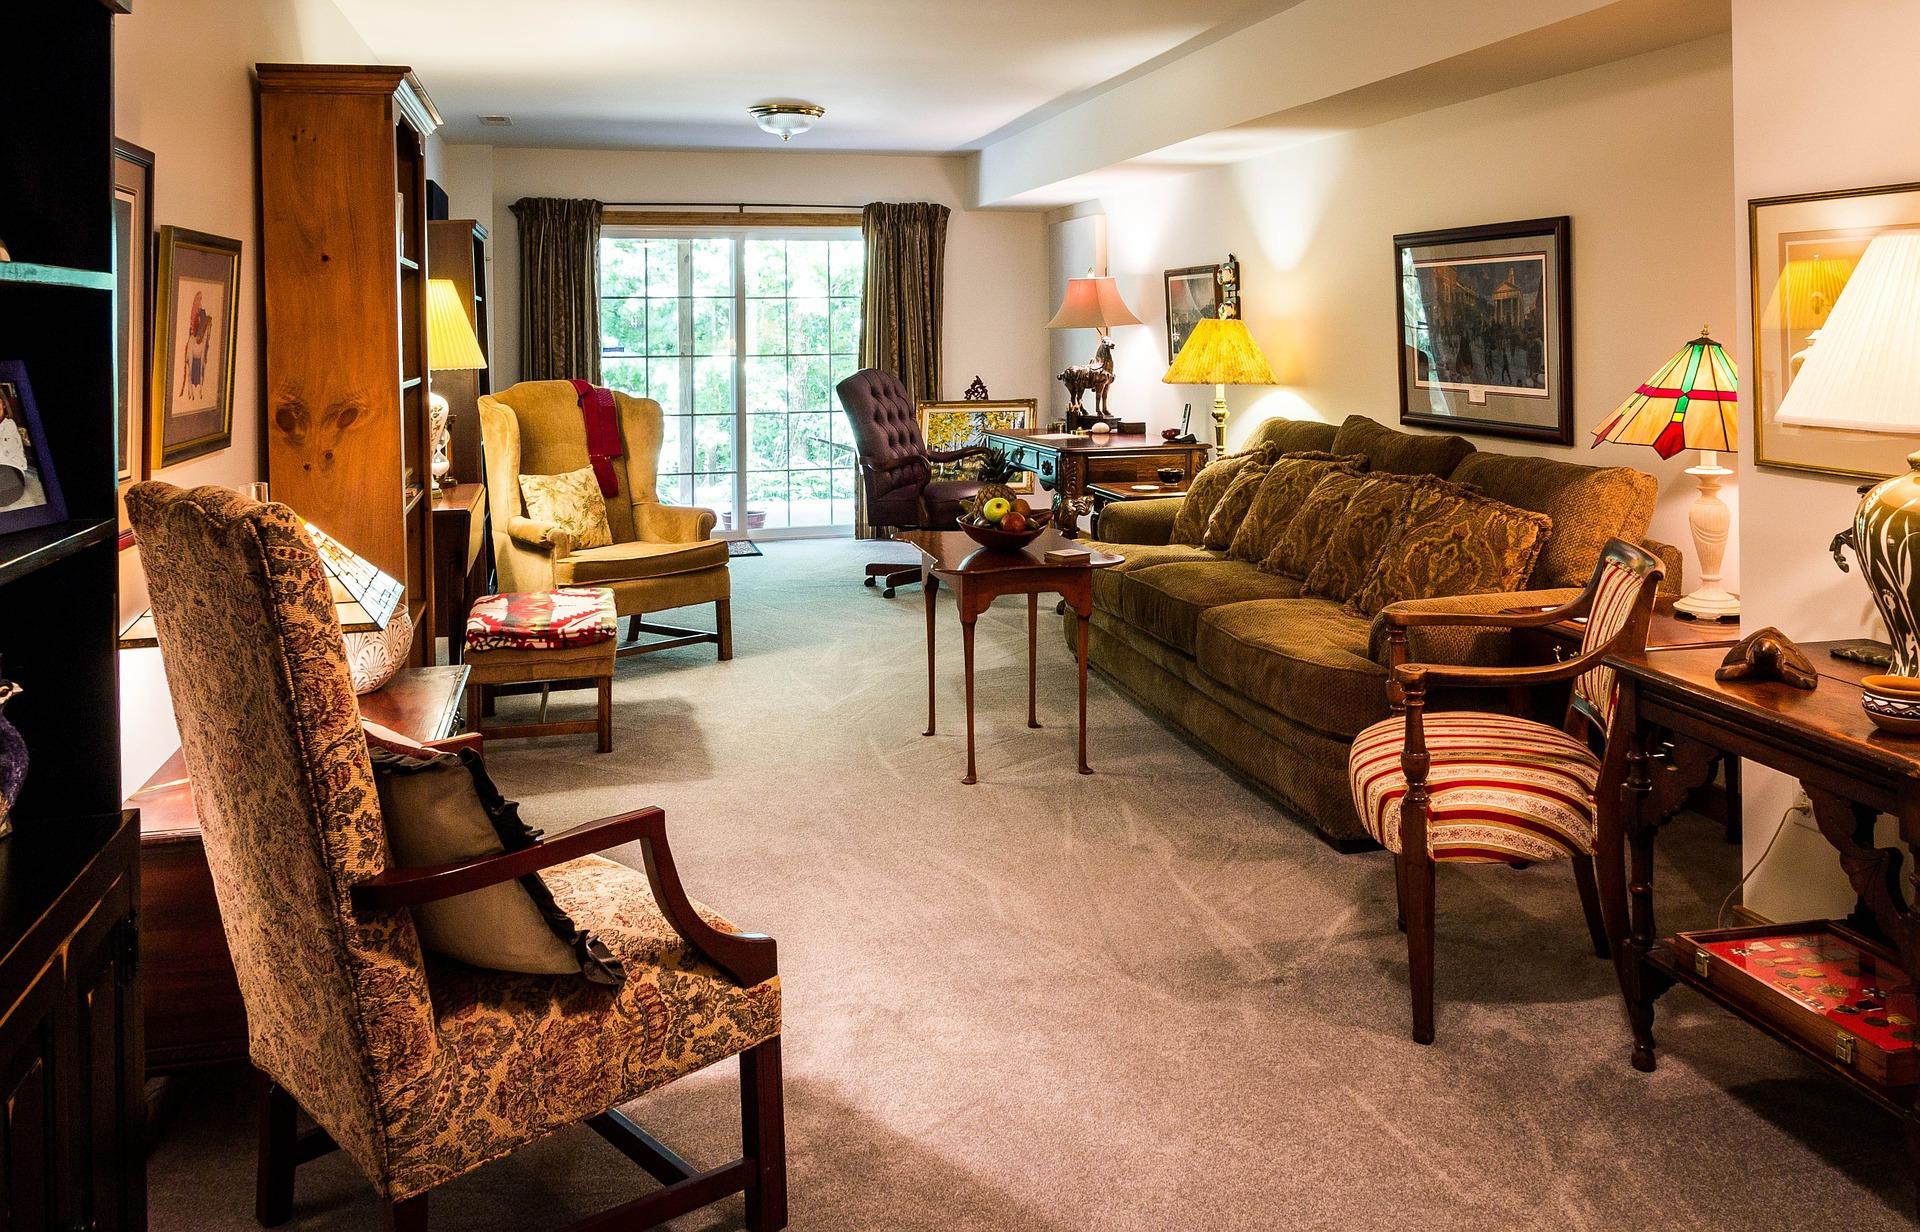 Home Improvement Inspiration The Modern Coastal Home